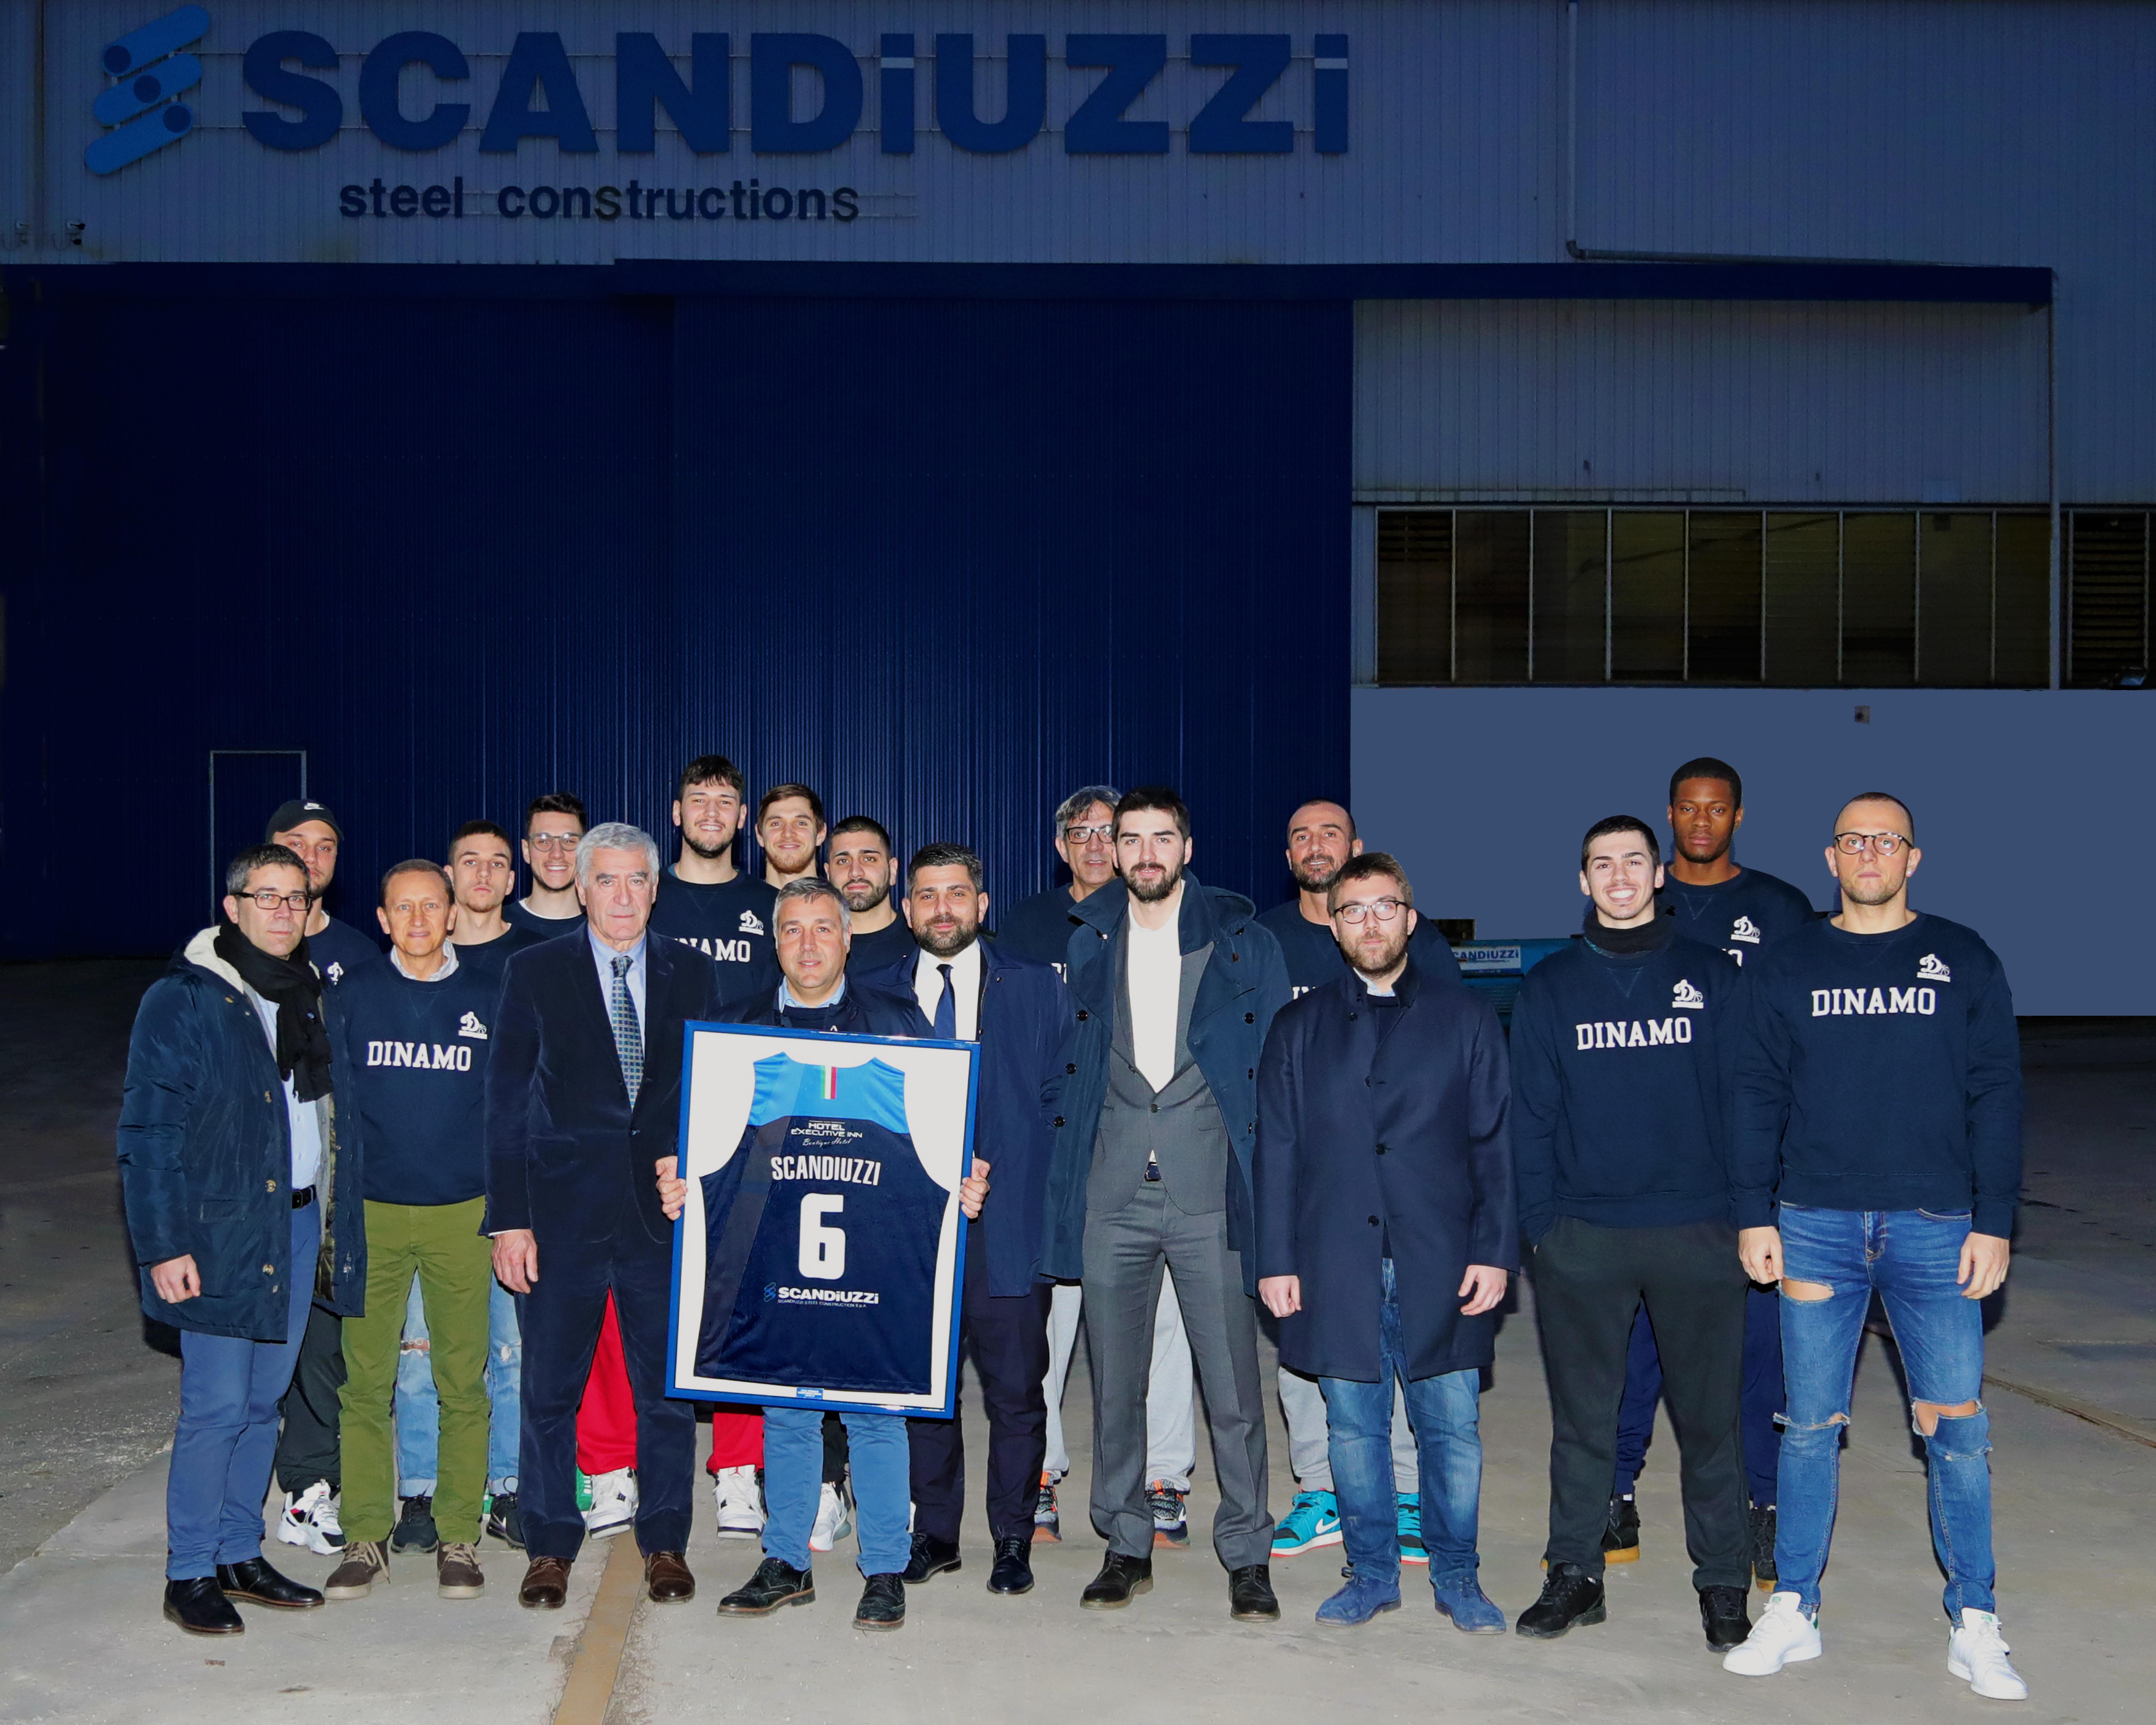 scandiuzzi_1